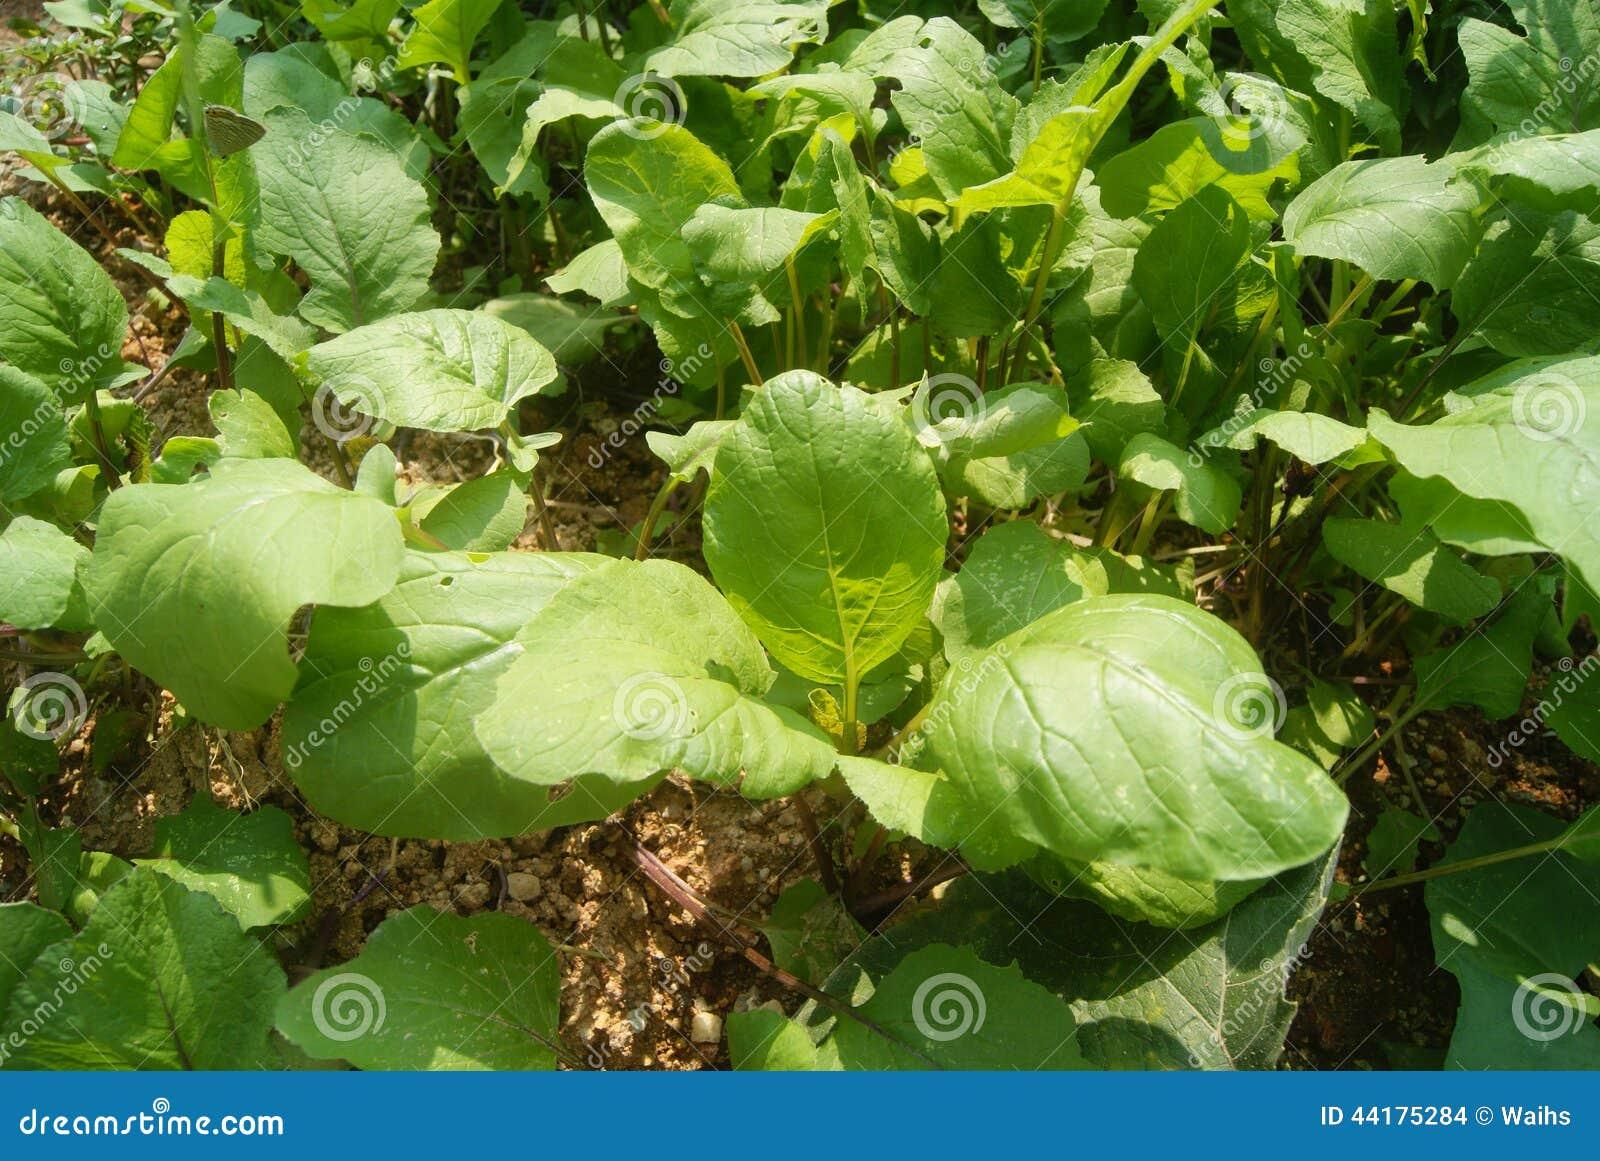 how to grow radish in backyard